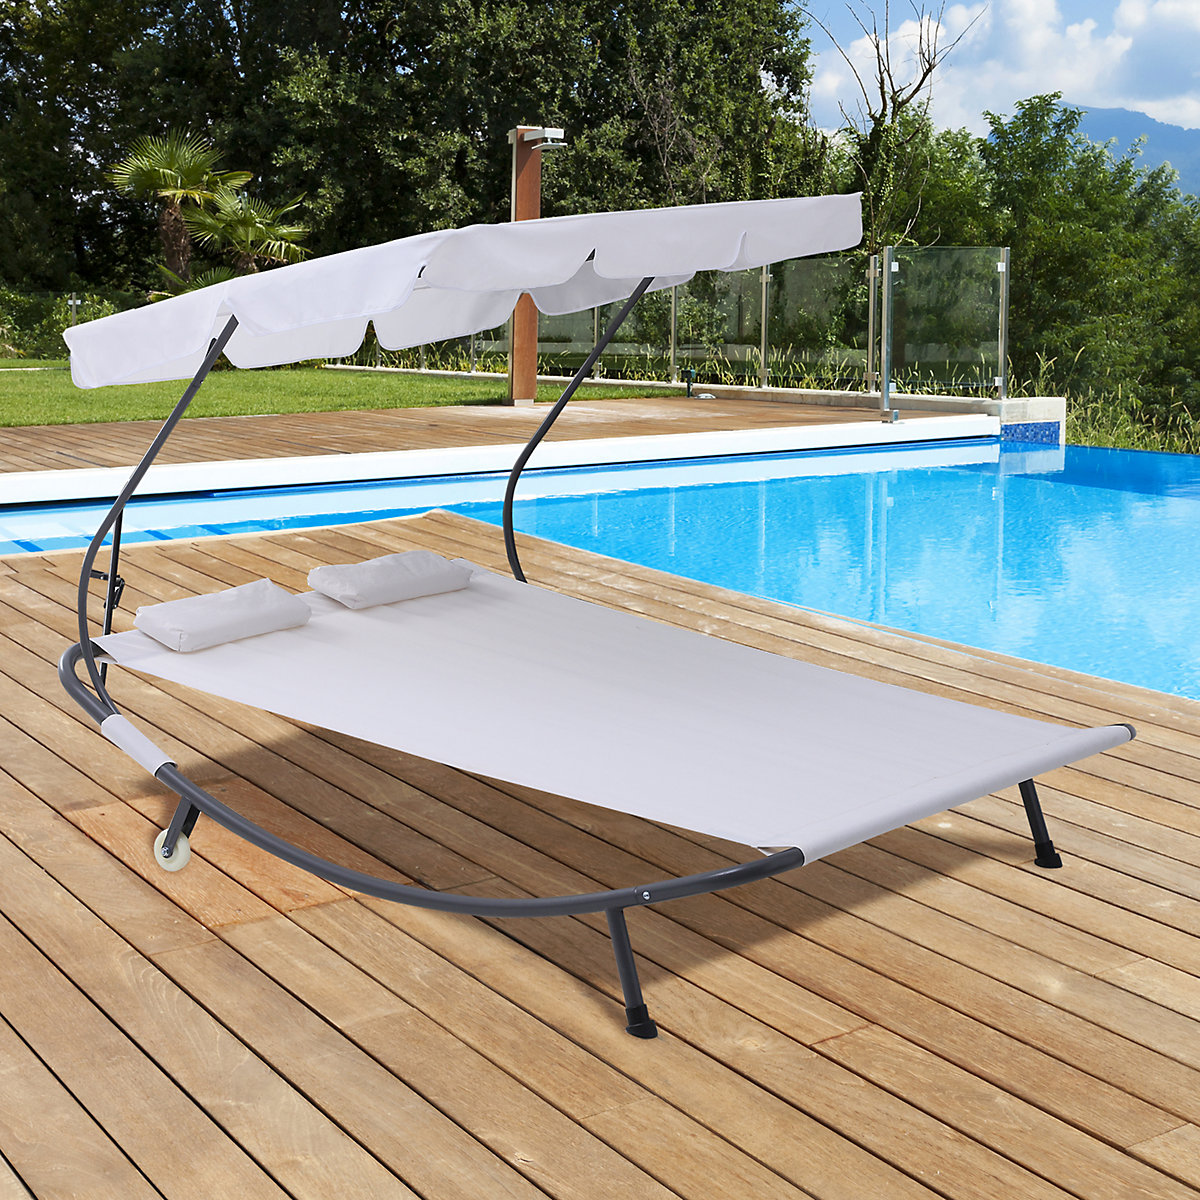 outsunny doppelliege mit dach beige outsunny yomonda. Black Bedroom Furniture Sets. Home Design Ideas